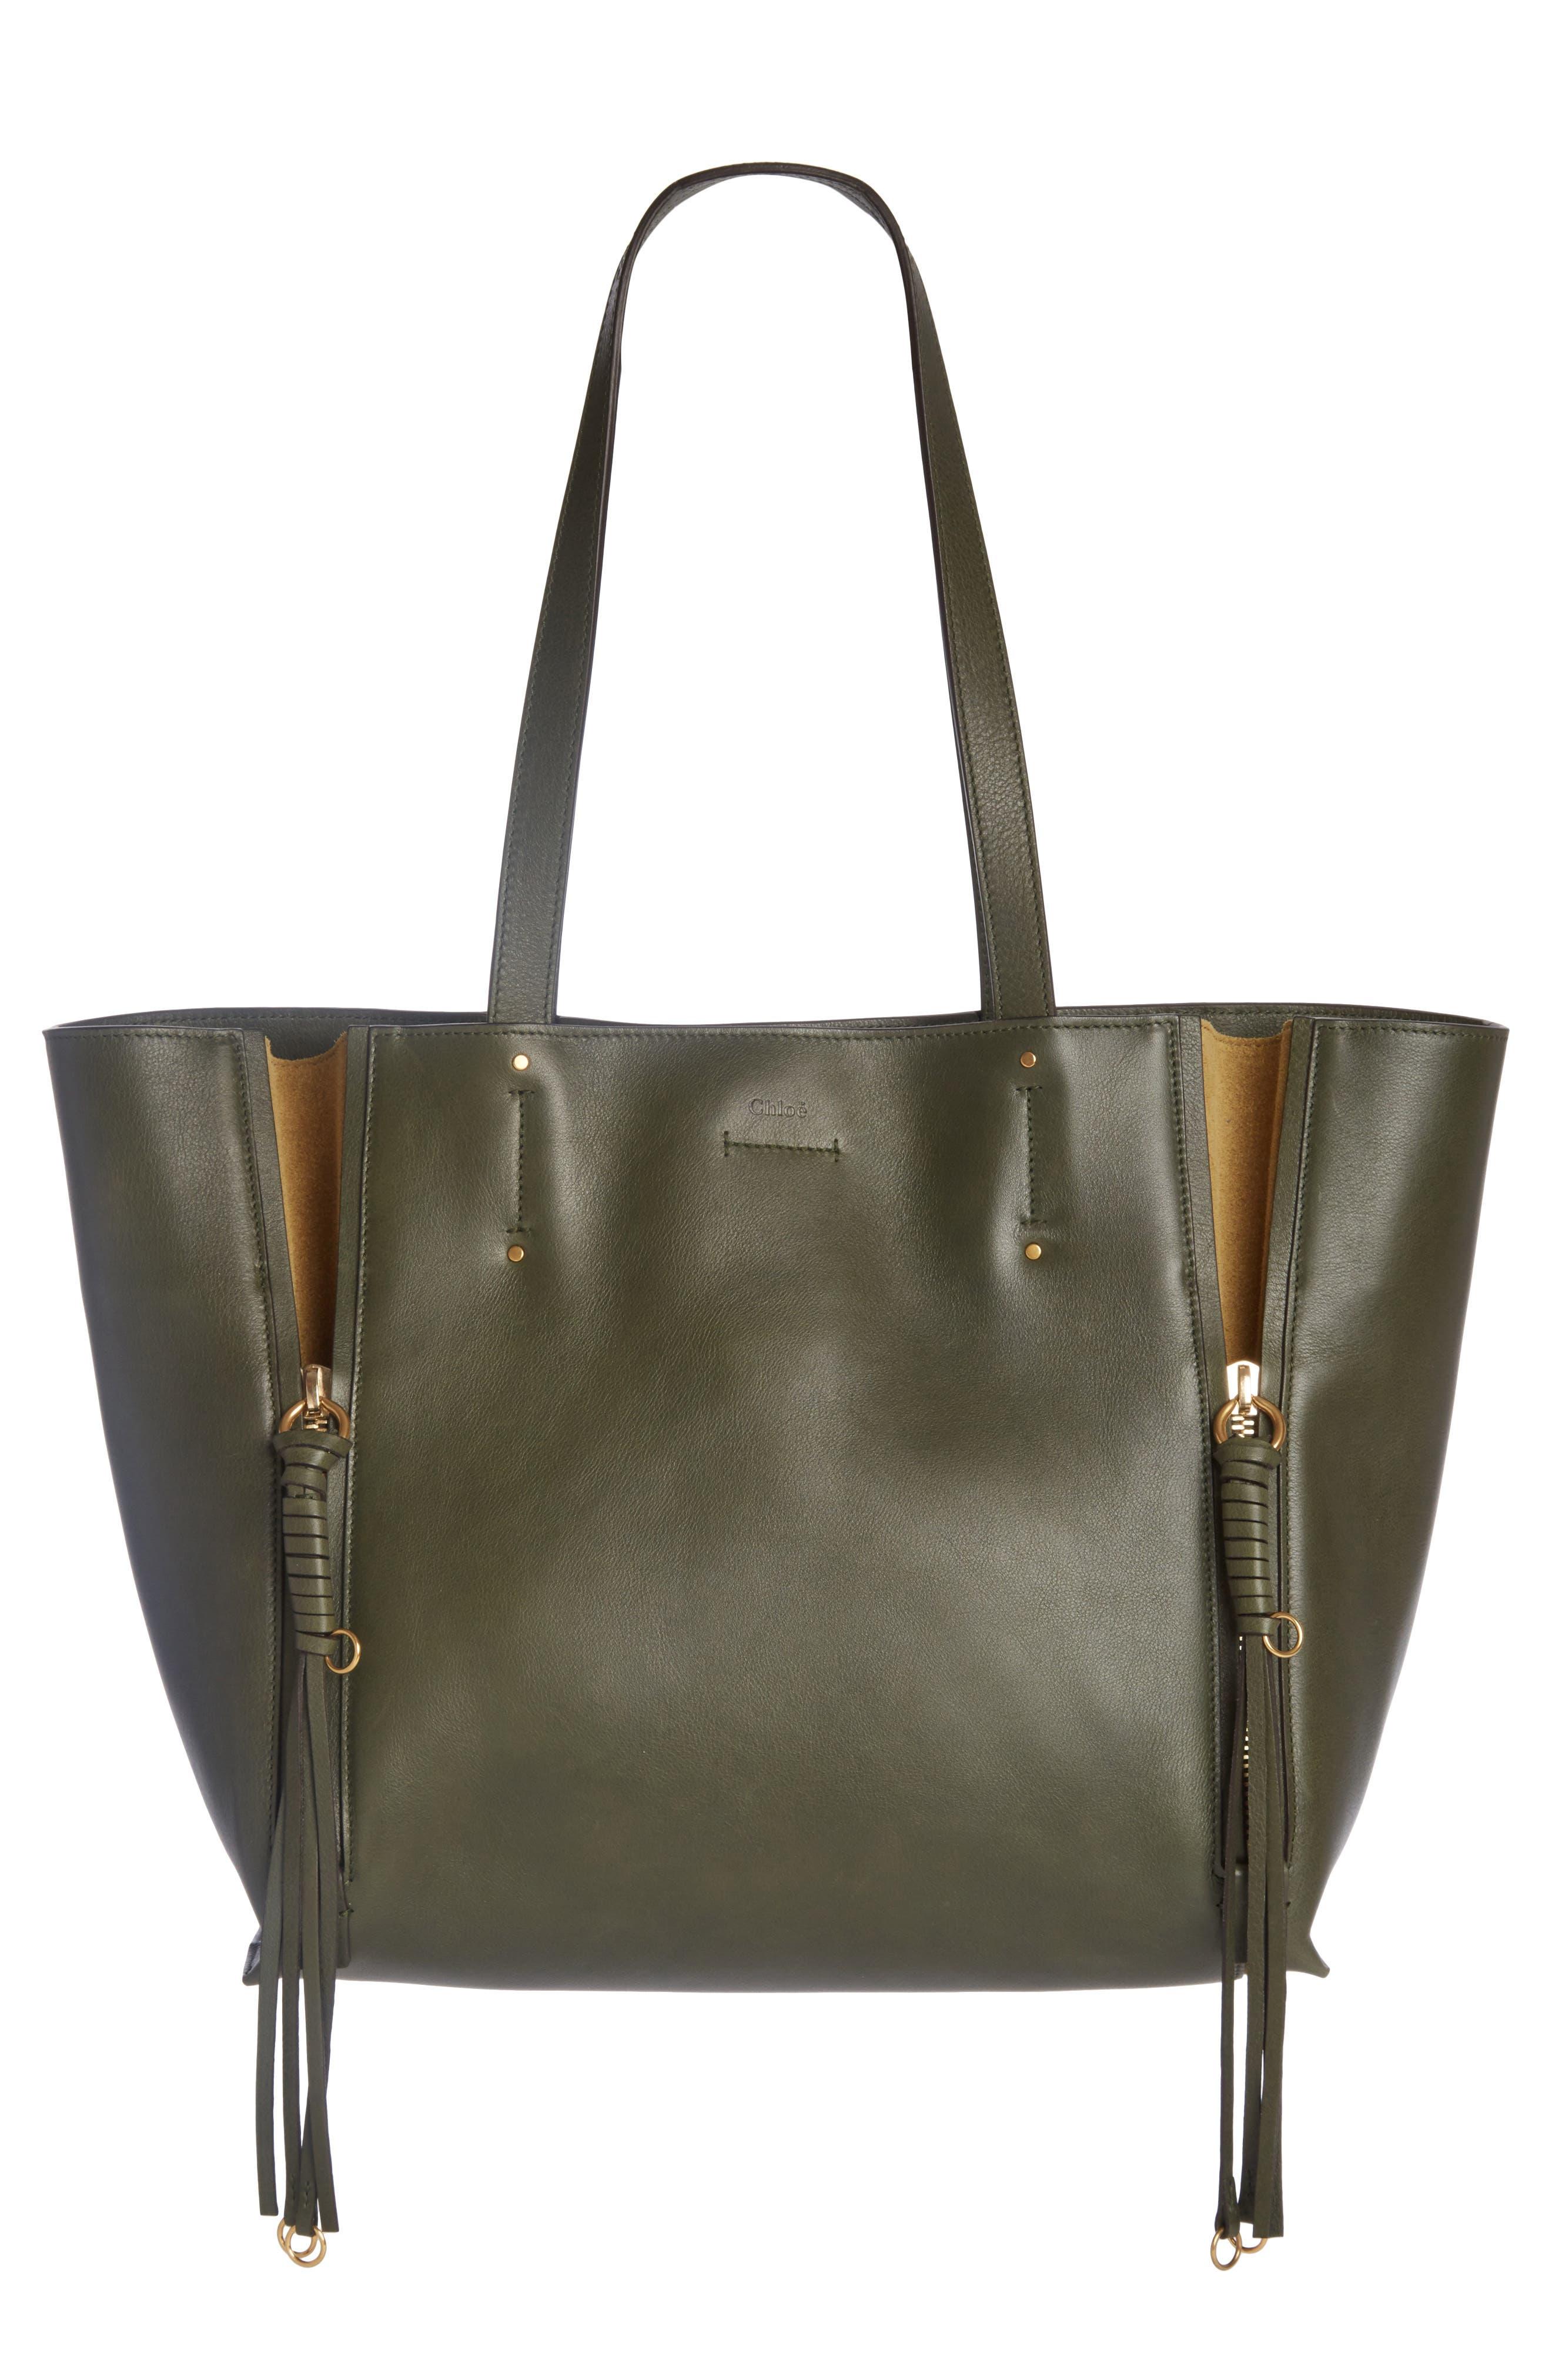 Chloé Medium Milo Calfskin Leather Tote